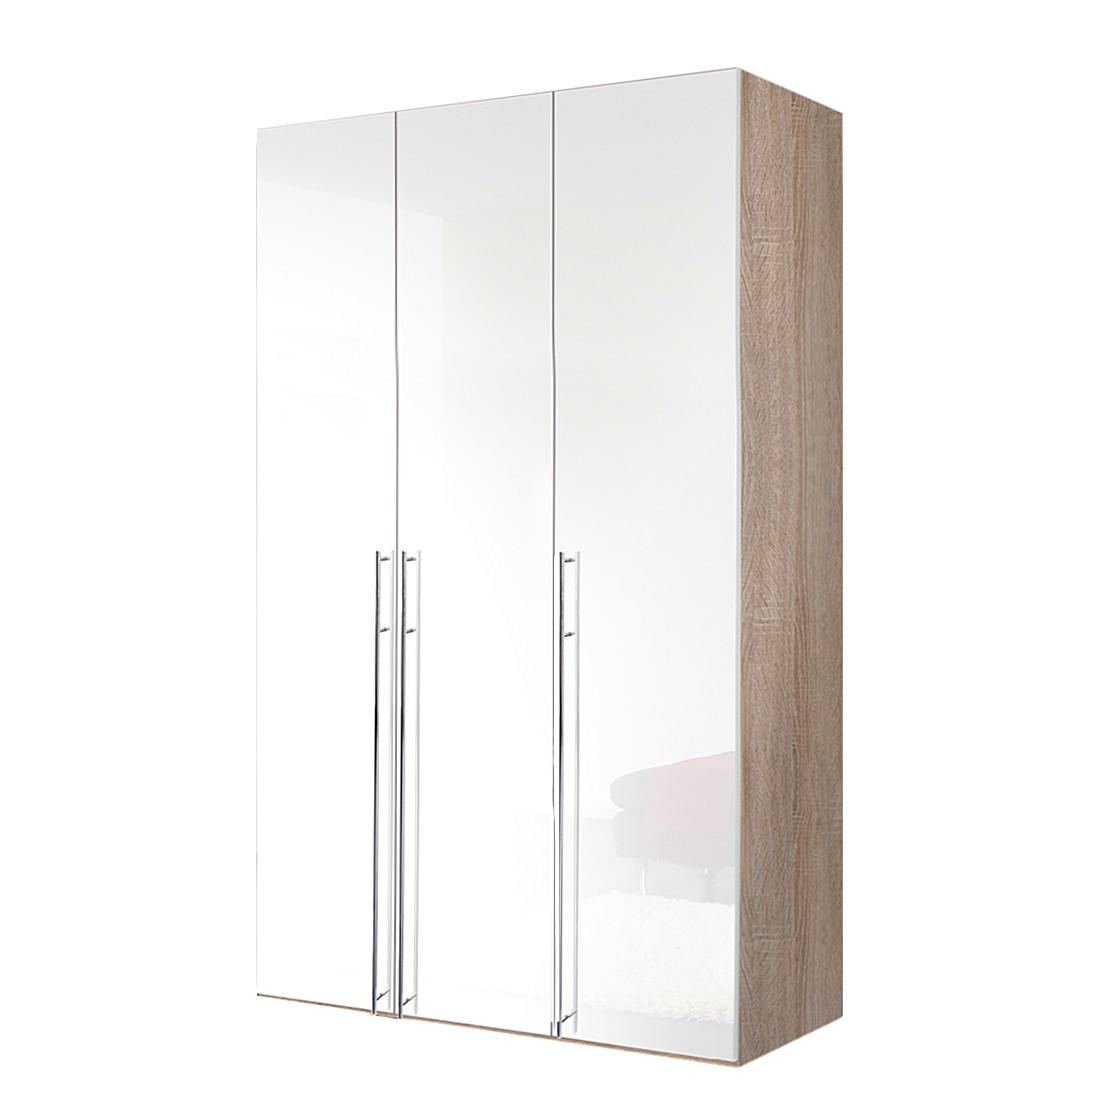 Armoire à portes battantes Brooklyn X - Imitation chêne de Sonoma / Vernis blanc - 150 cm (3 portes)